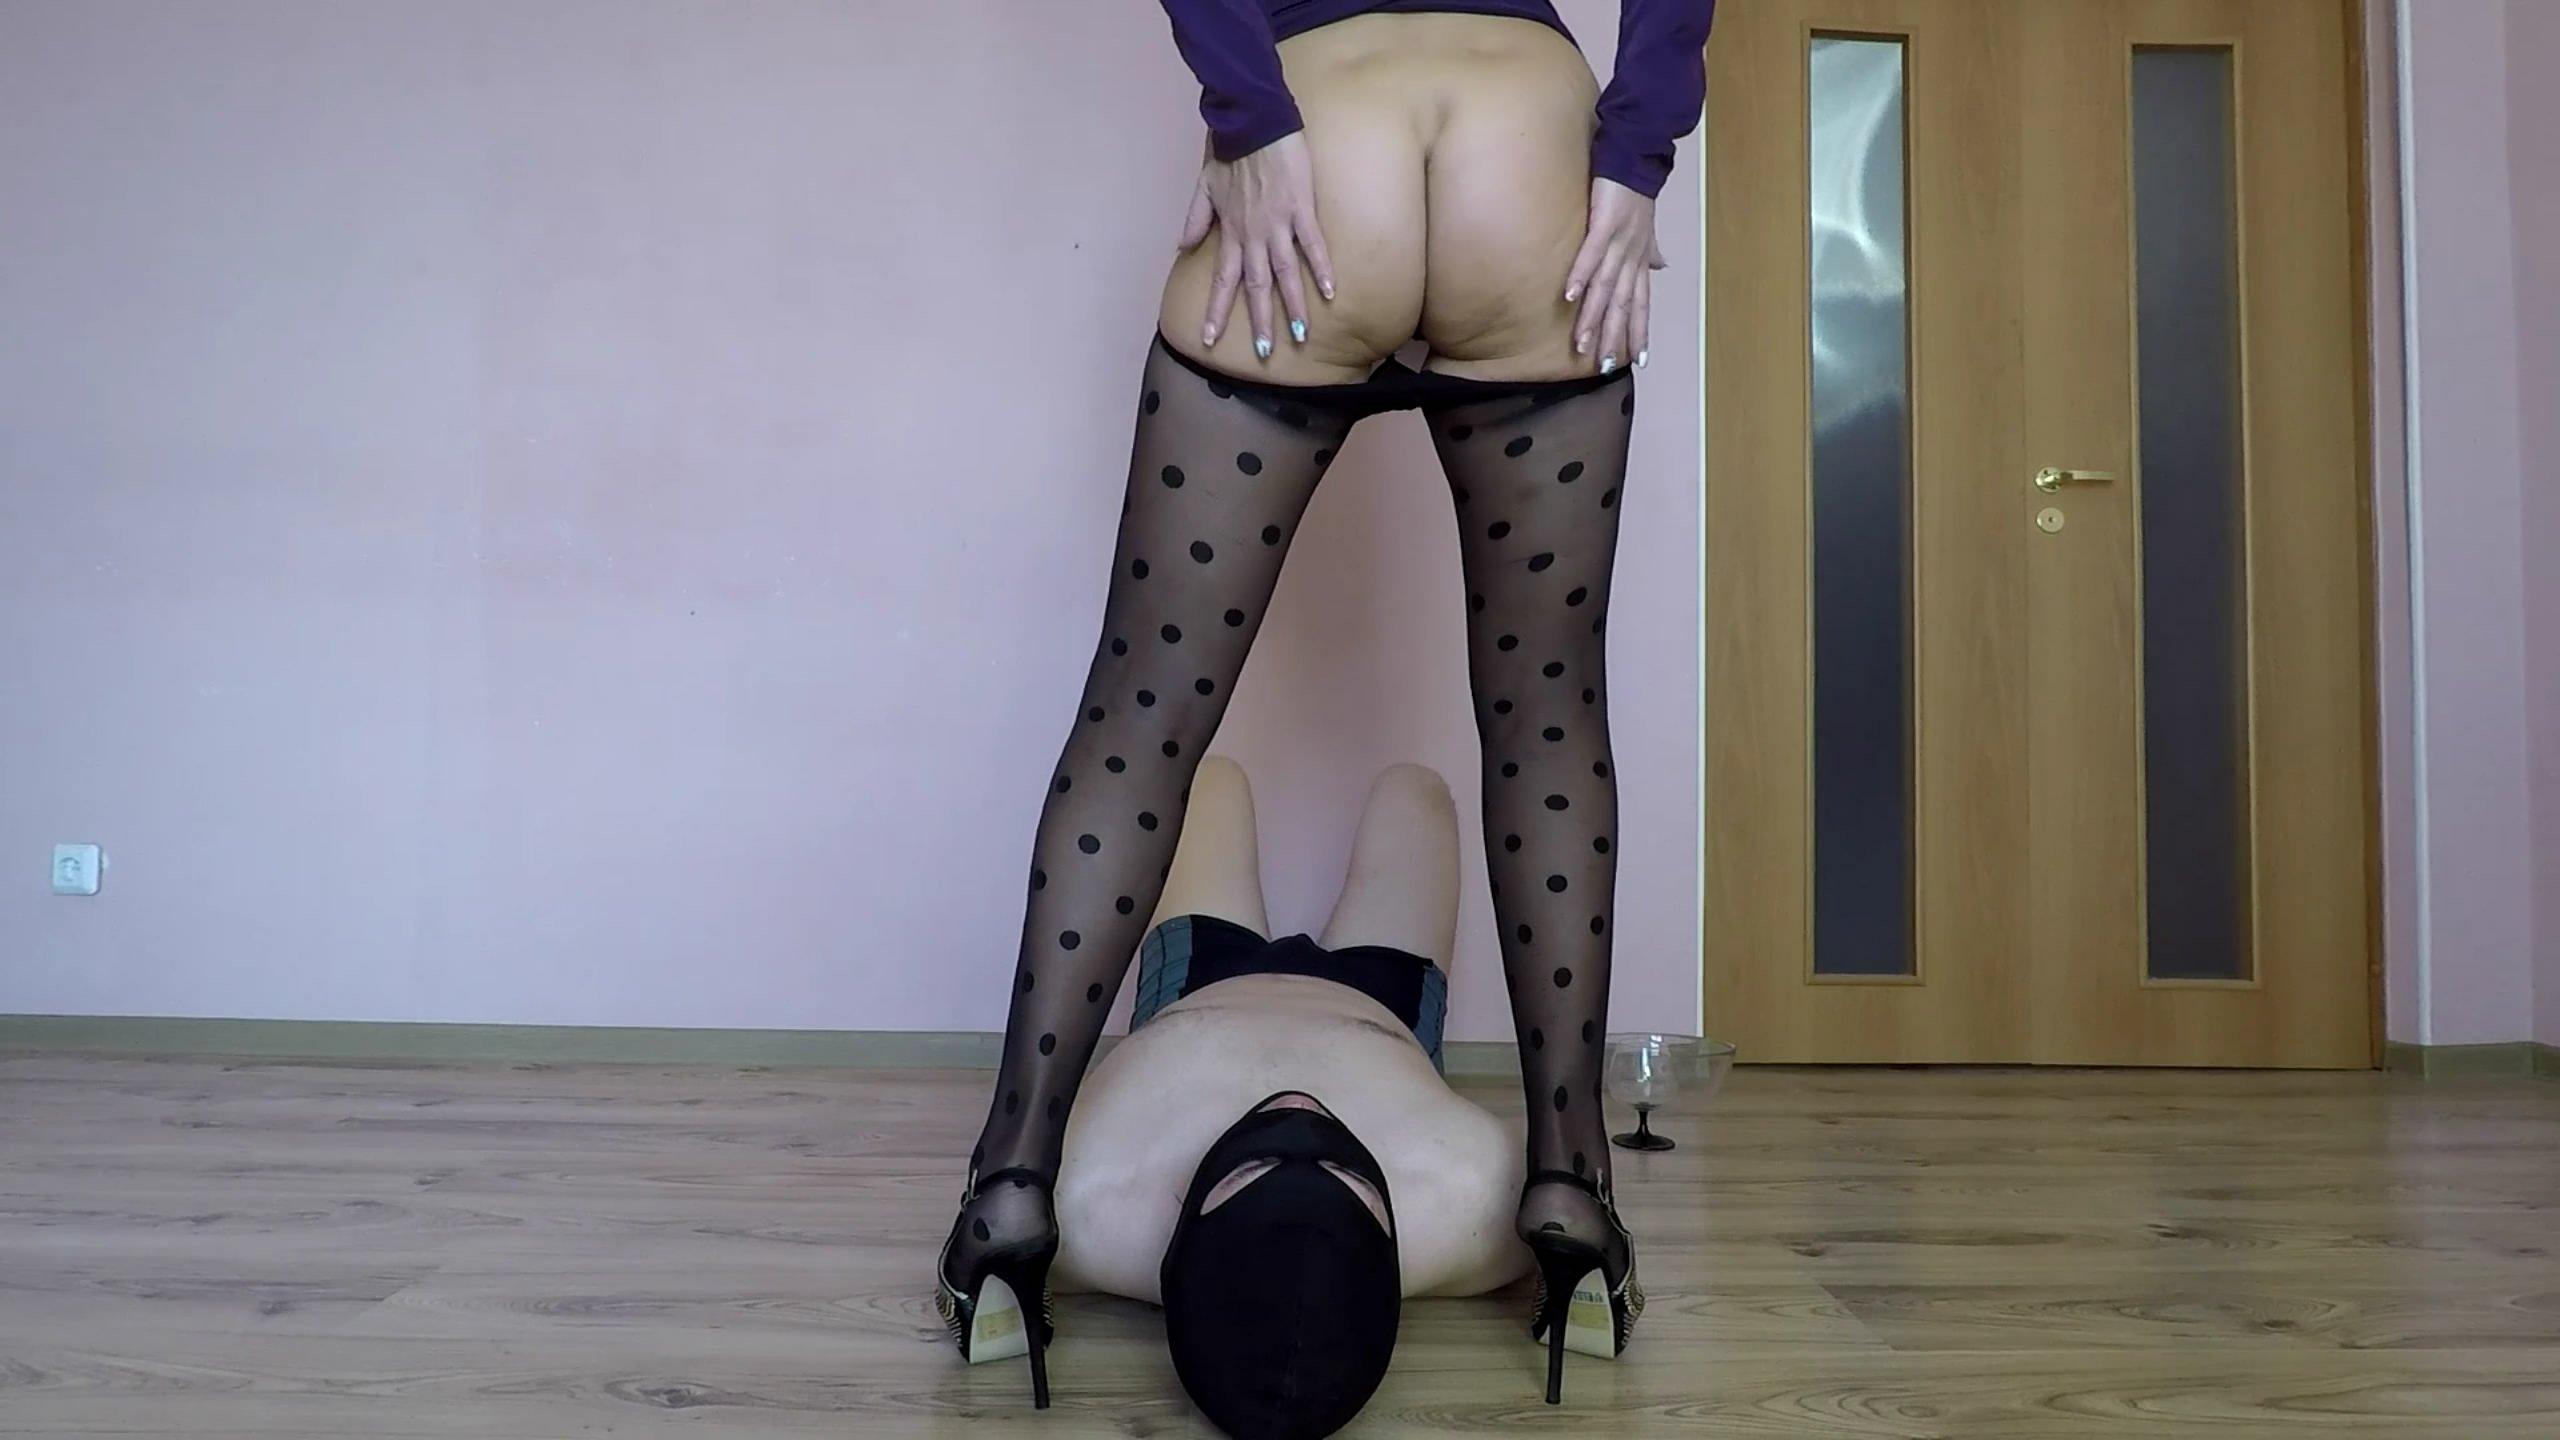 Mistress Shit for You starring in video  scatdesire ($13.99 ScatShop) – Toilet Slavery